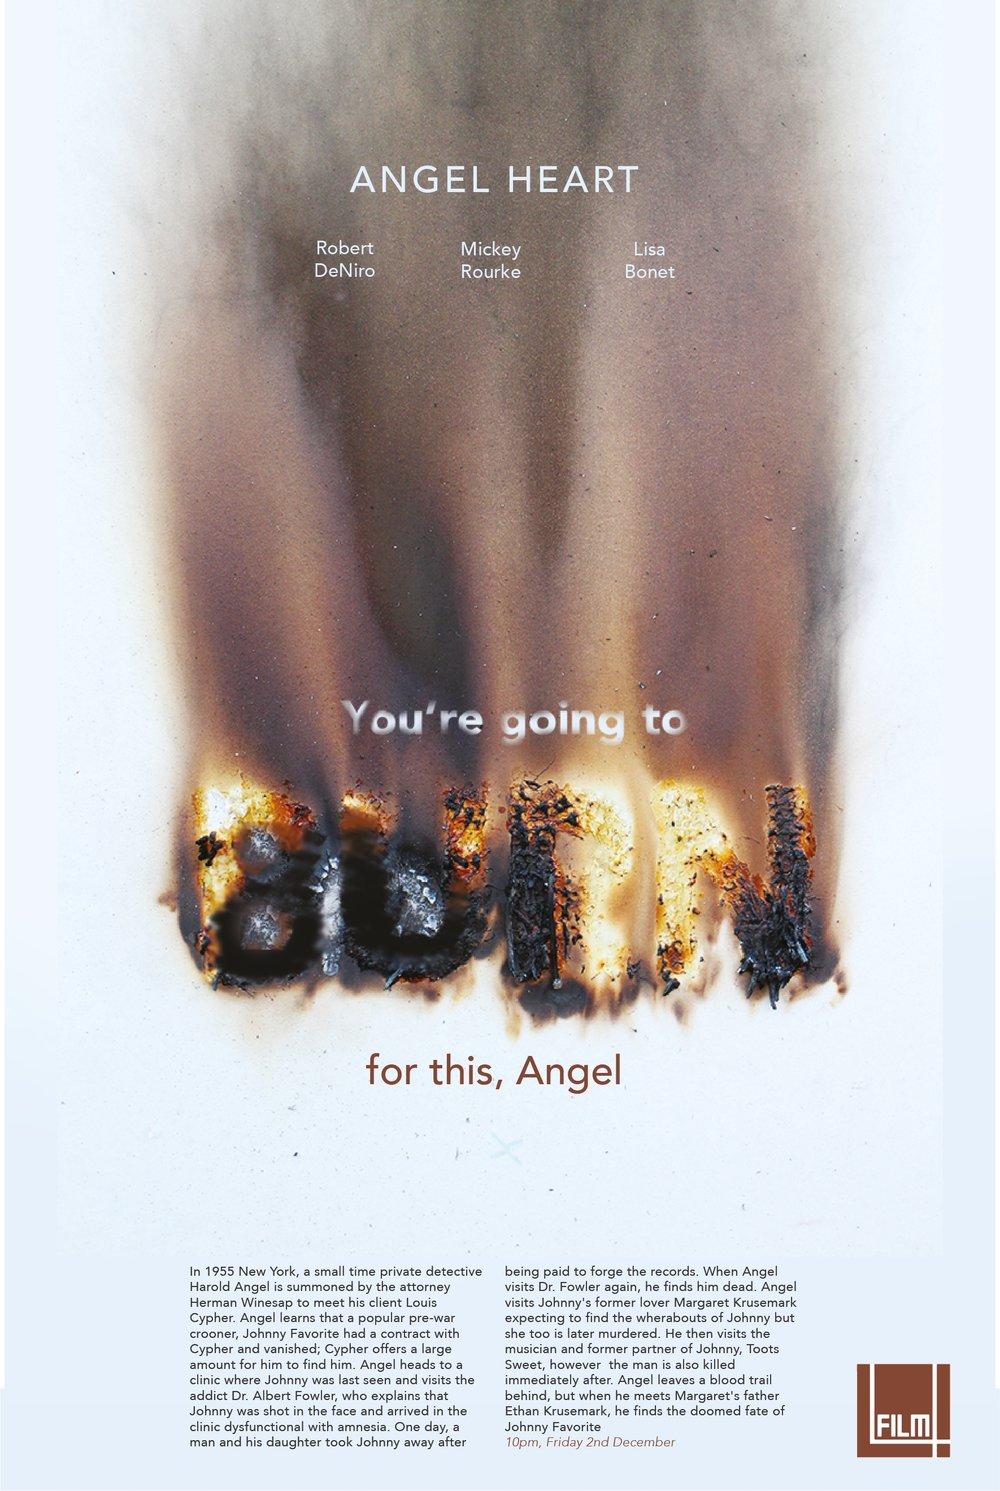 Film Poster Typography